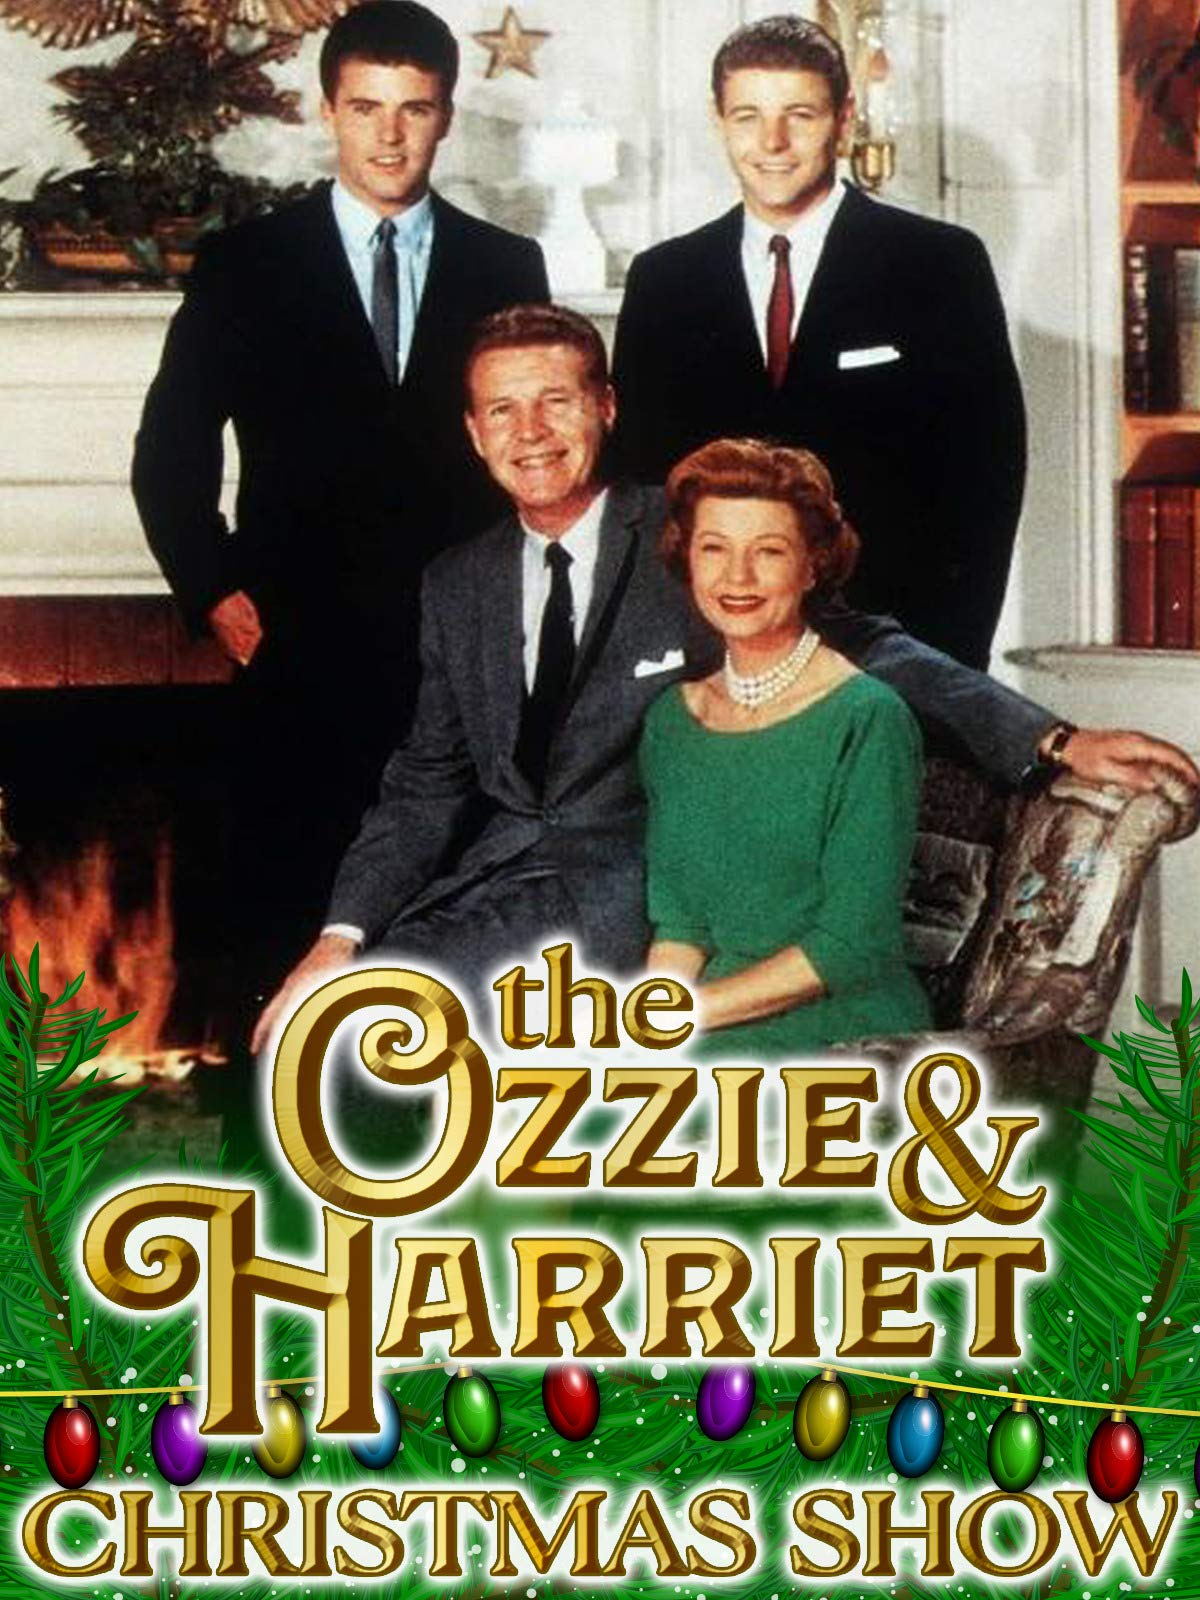 The Ozzie & Harriet Christmas Show